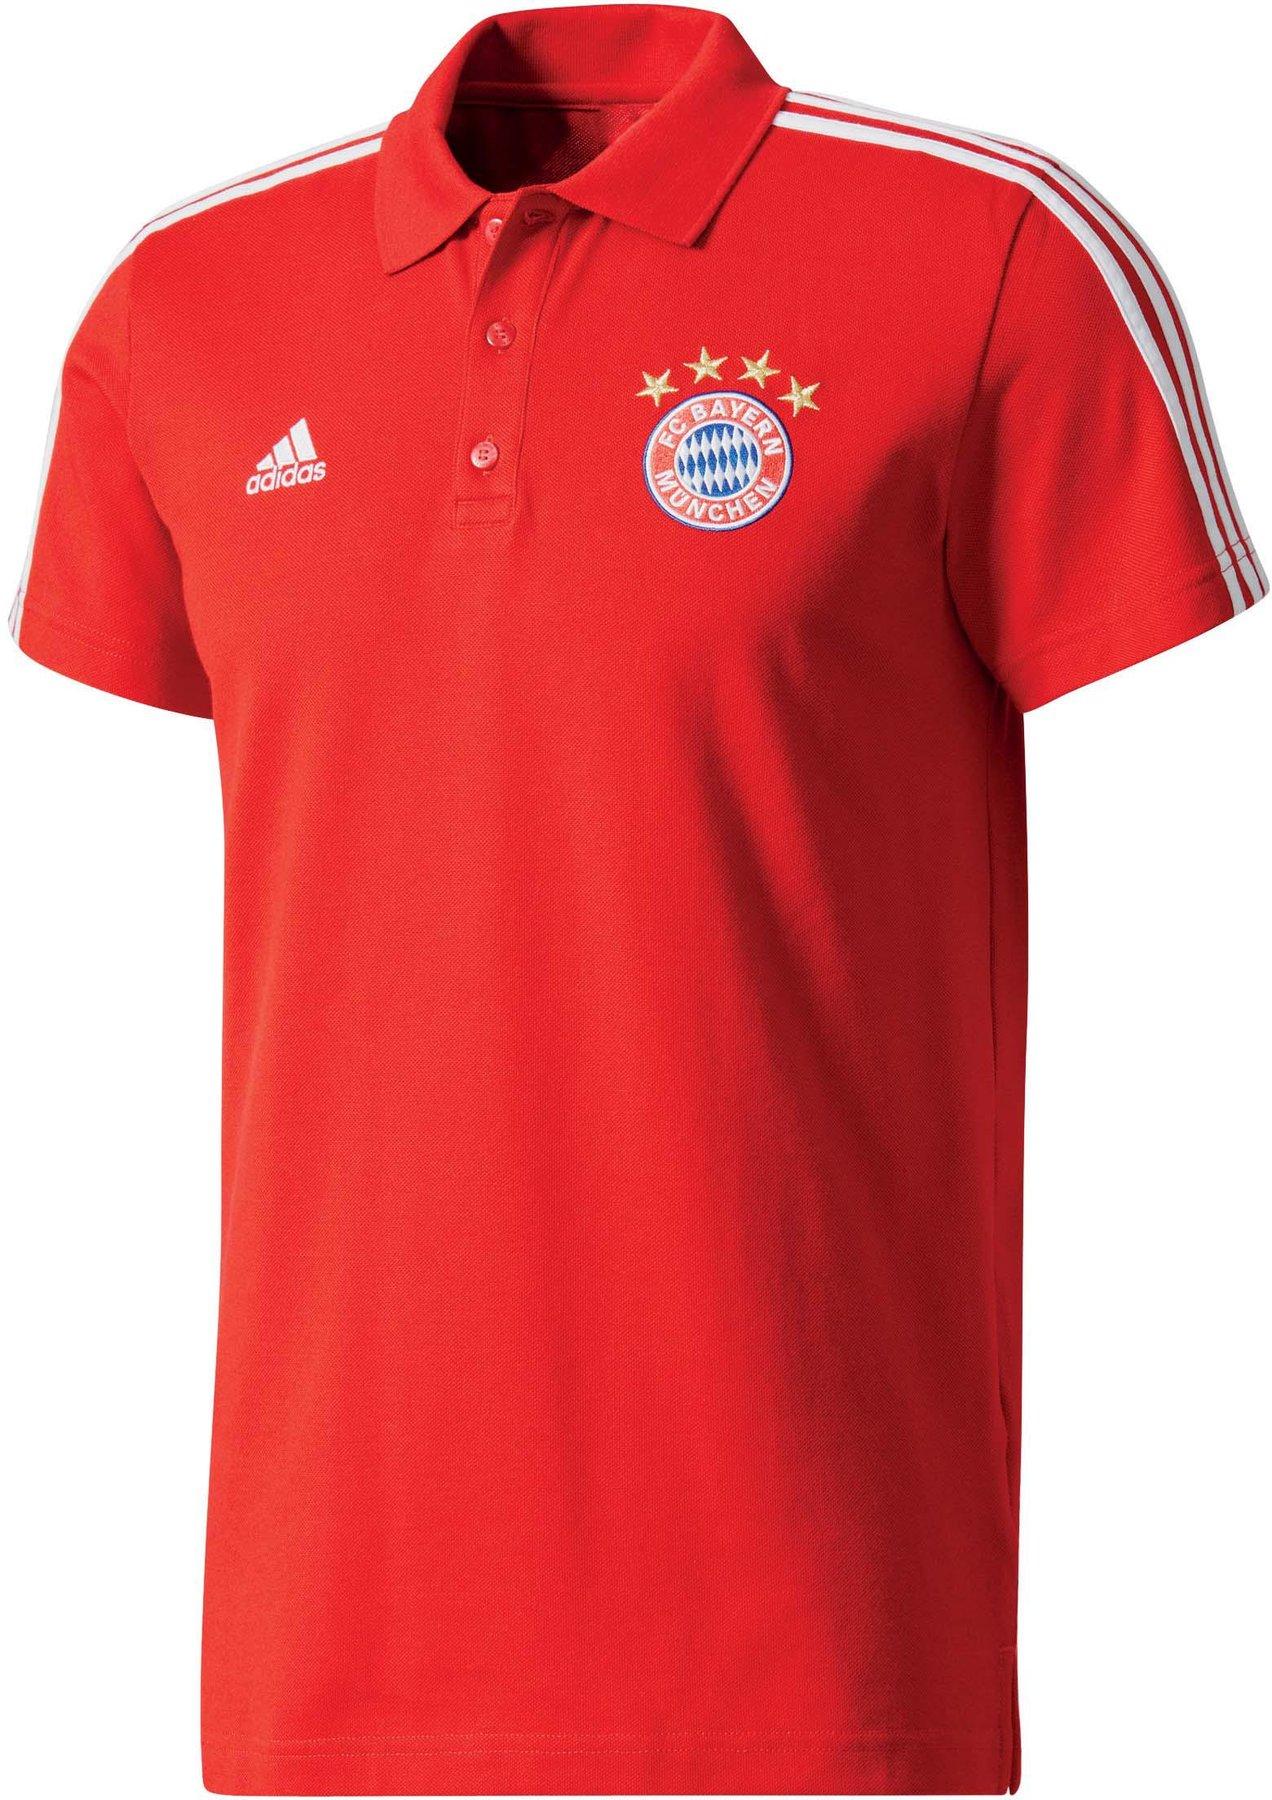 Tshirt XXL FC Bayern M/ünchen FunktionsPoloshirt Forever Shirt Polo T-Shirt Poloshirt Funktionsshirt